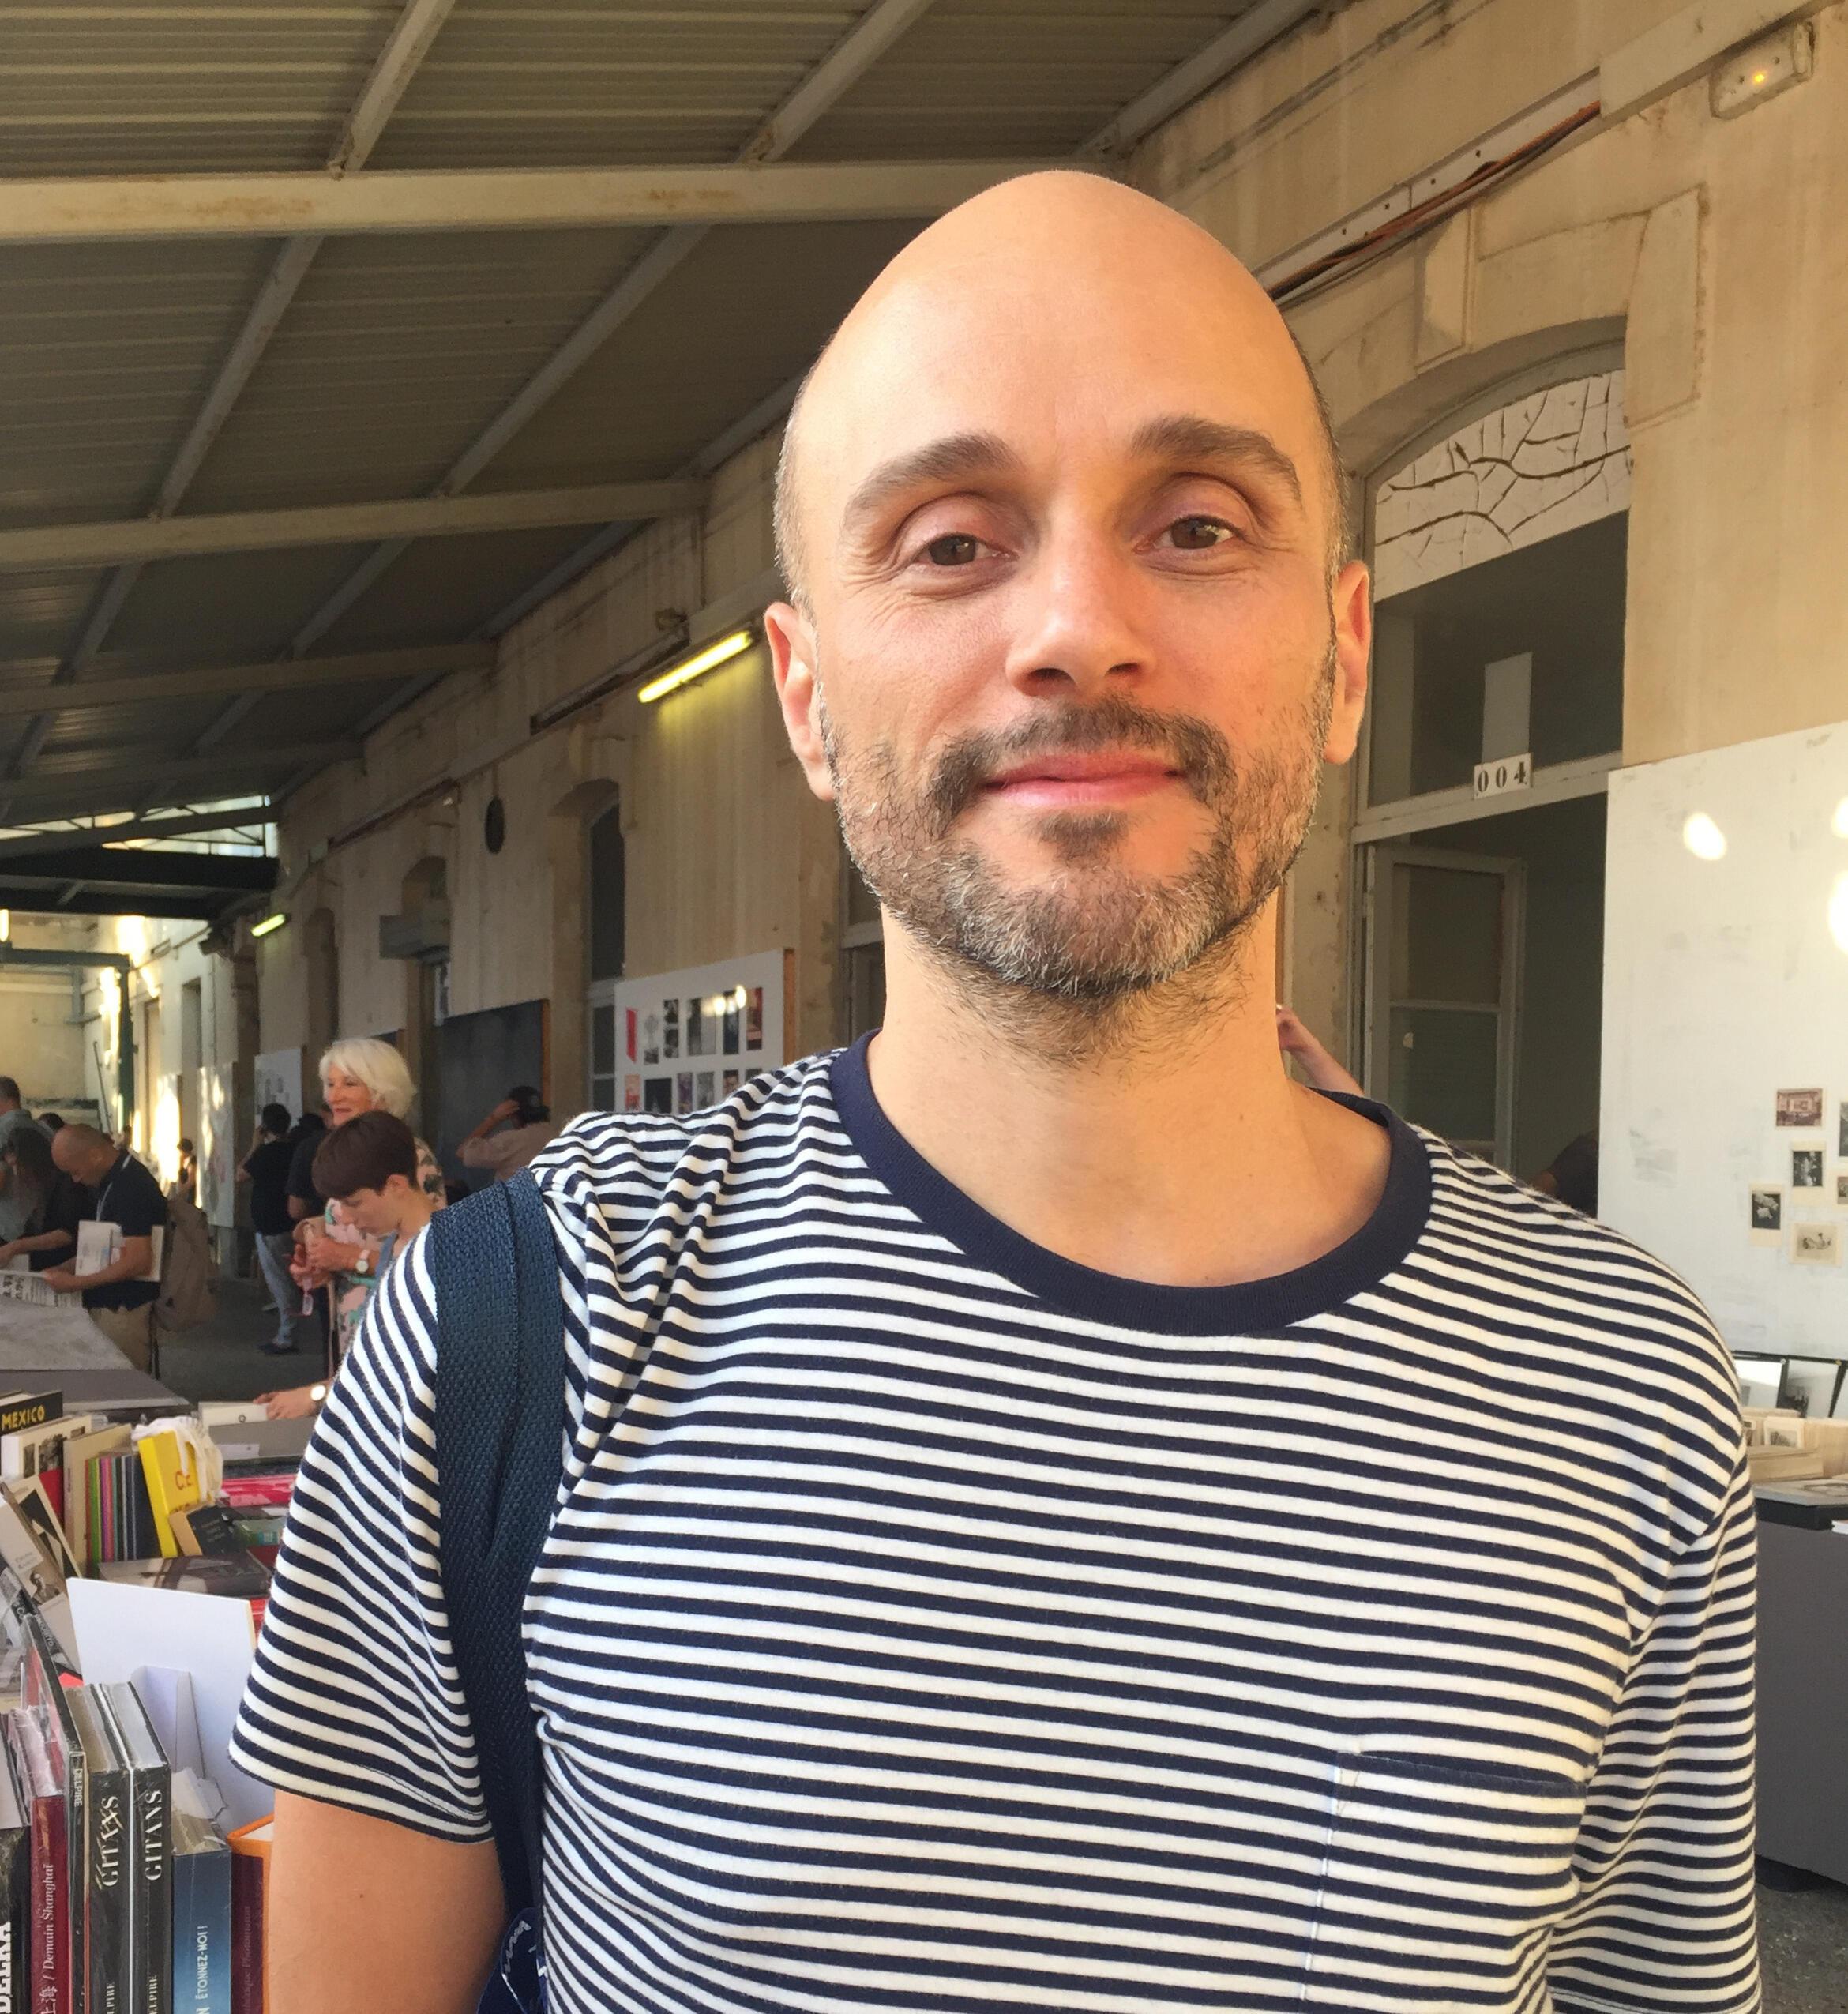 Thyago Nogueira, coordenador da área de fotografia contemporânea do Instituto Moreira Salles